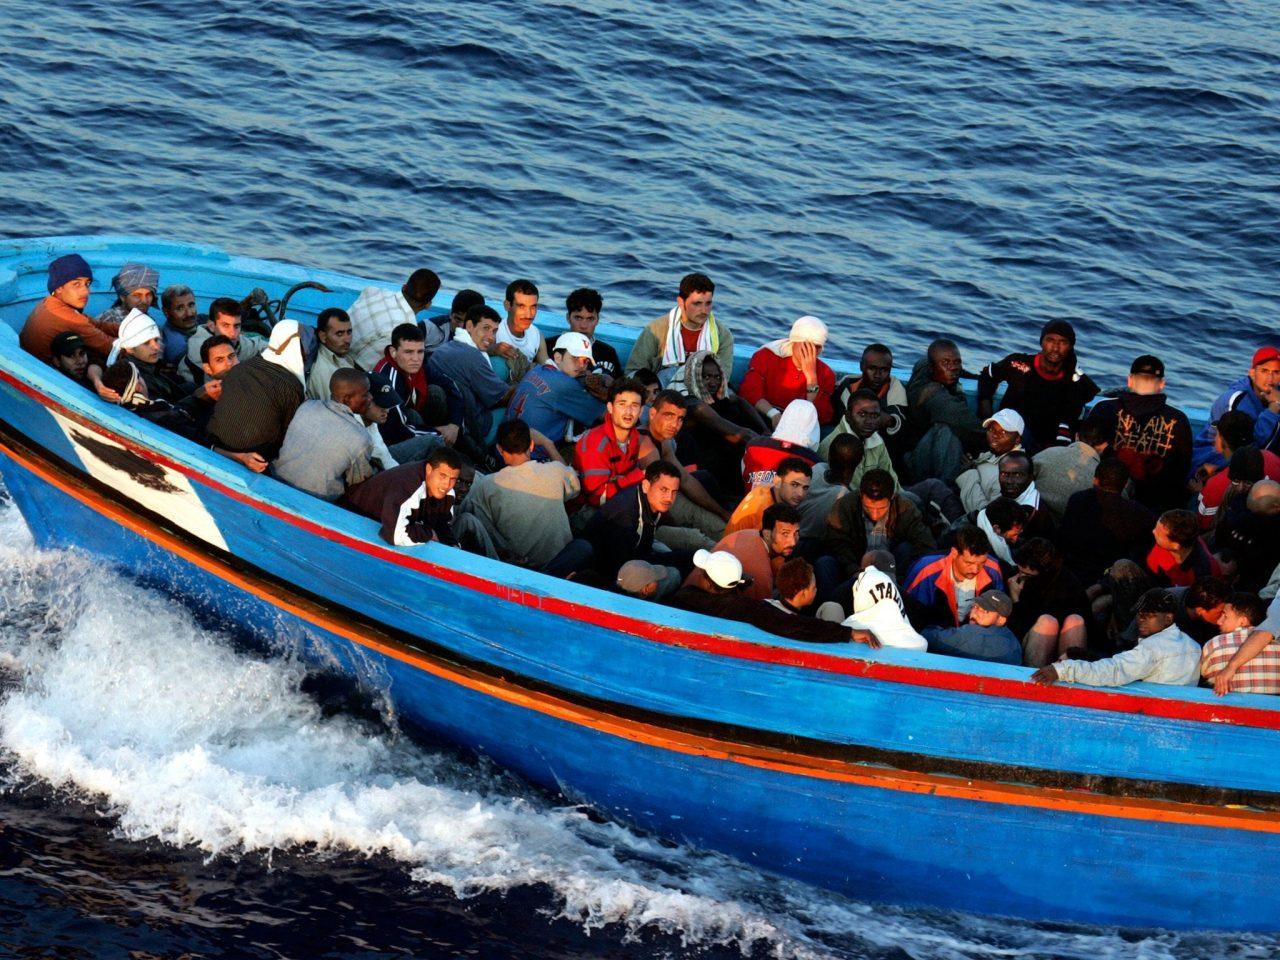 refugee-boat-1280x960.jpg